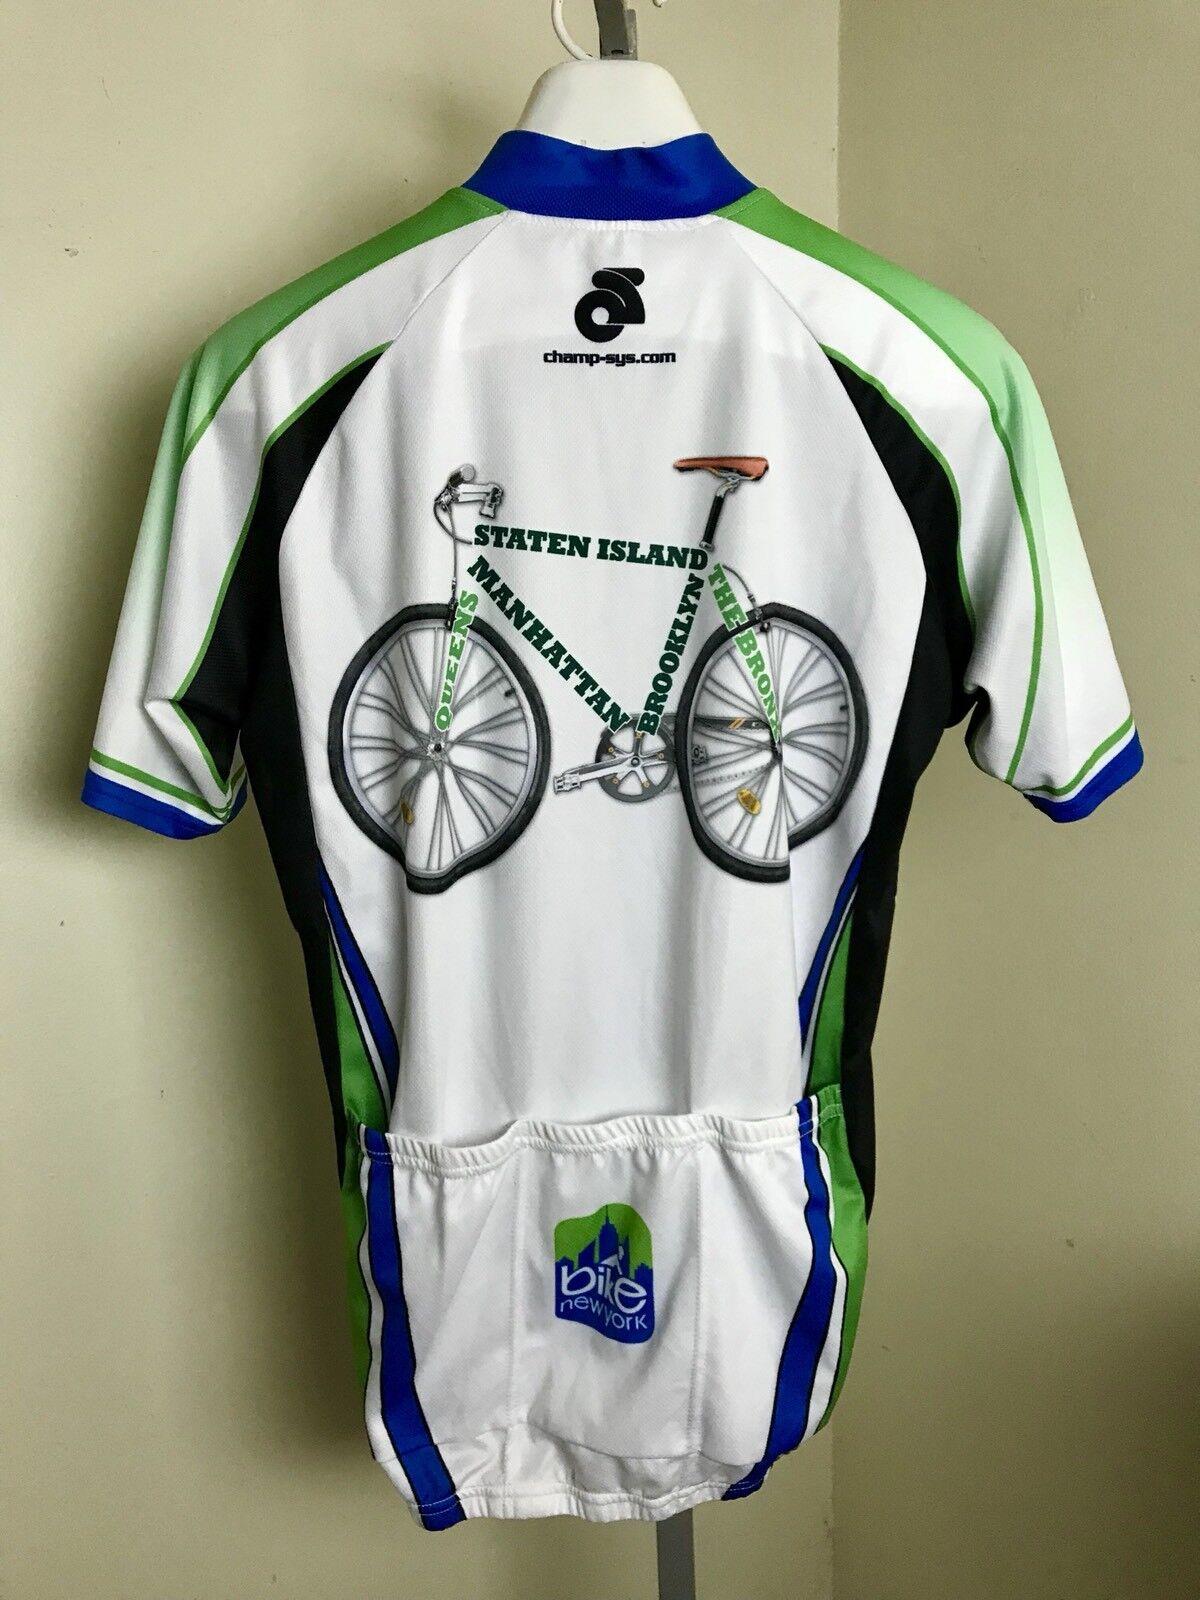 2011 Bike New York Cycling Cycling Cycling Jersey Shirt Men's 1 4 Zip XL Champion Systems 5 Boro 9ea08a